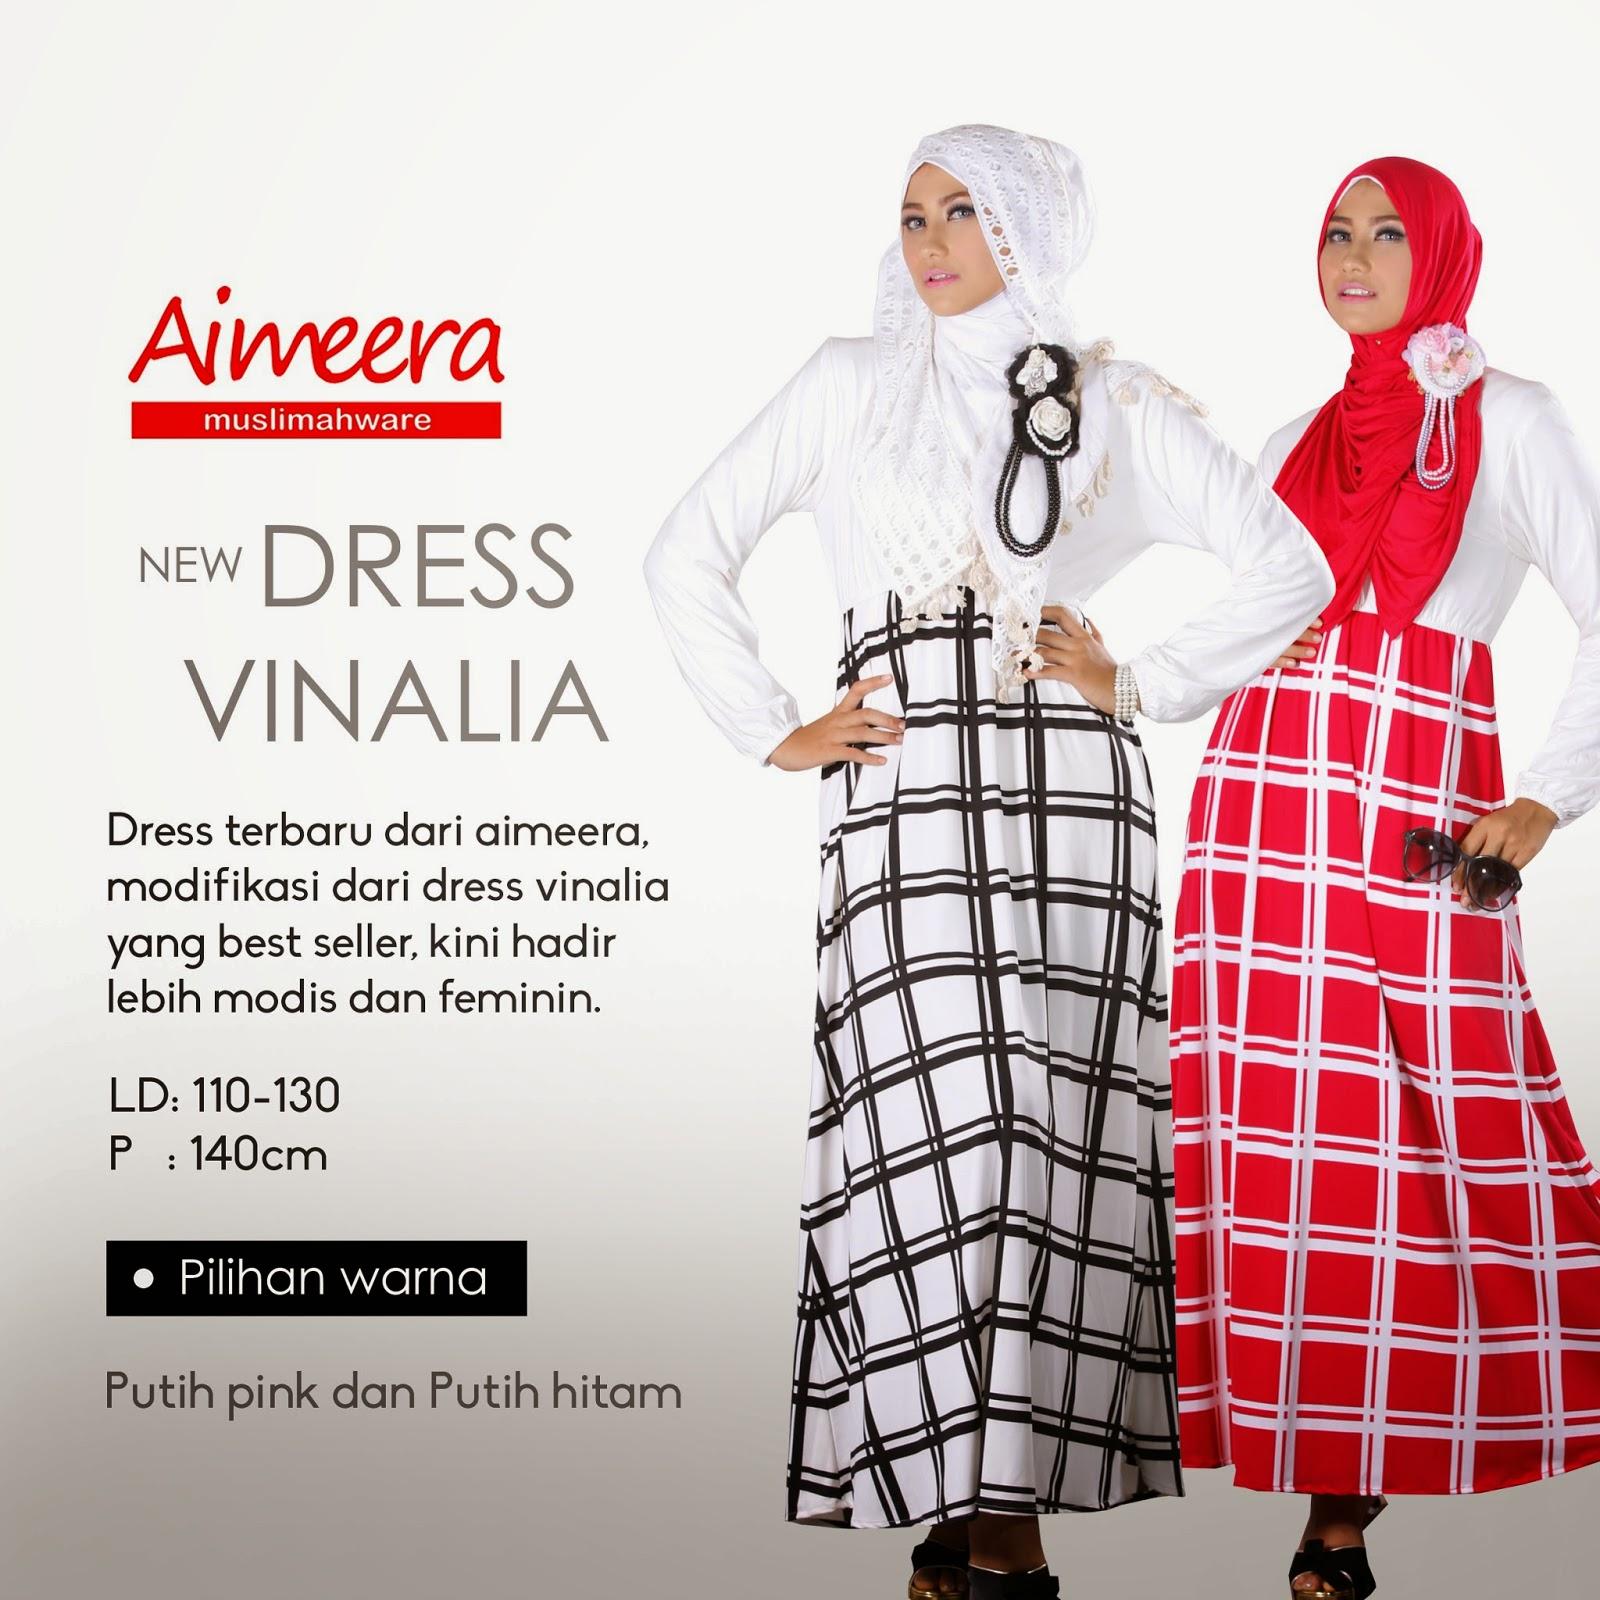 New Dress Vinalia